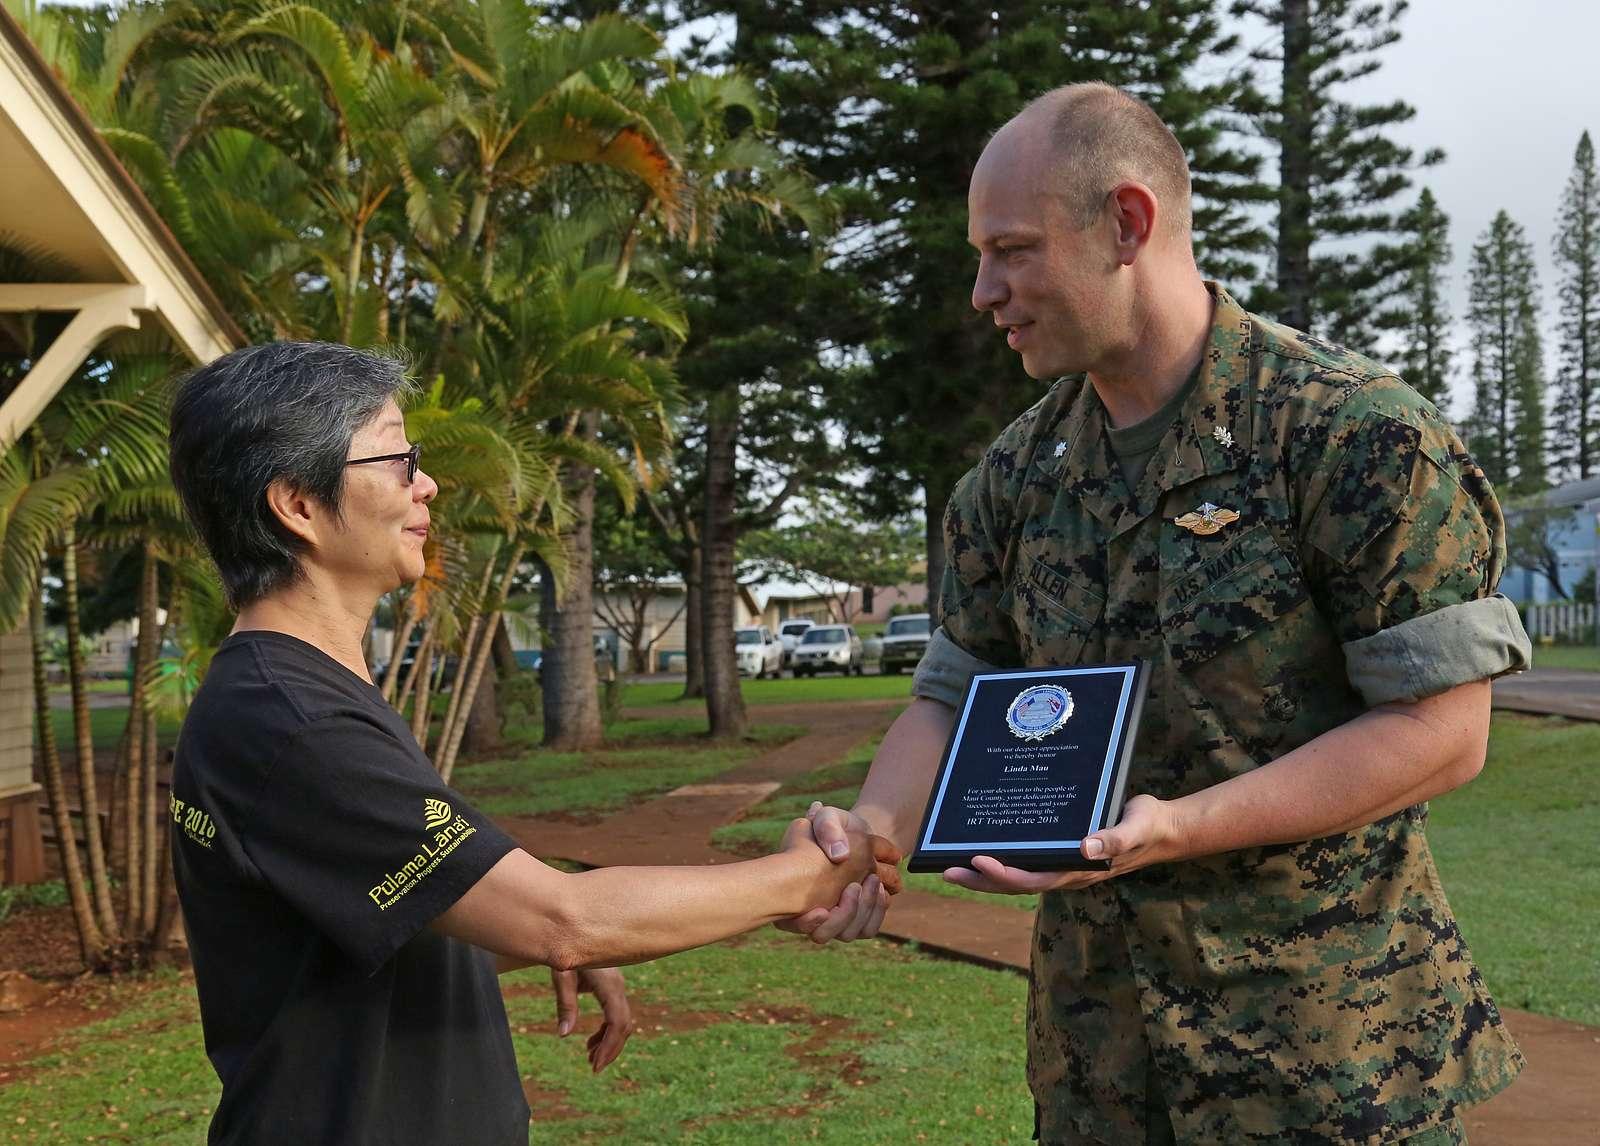 Linda Mau, Tropic Care volunteer and Lanai public health